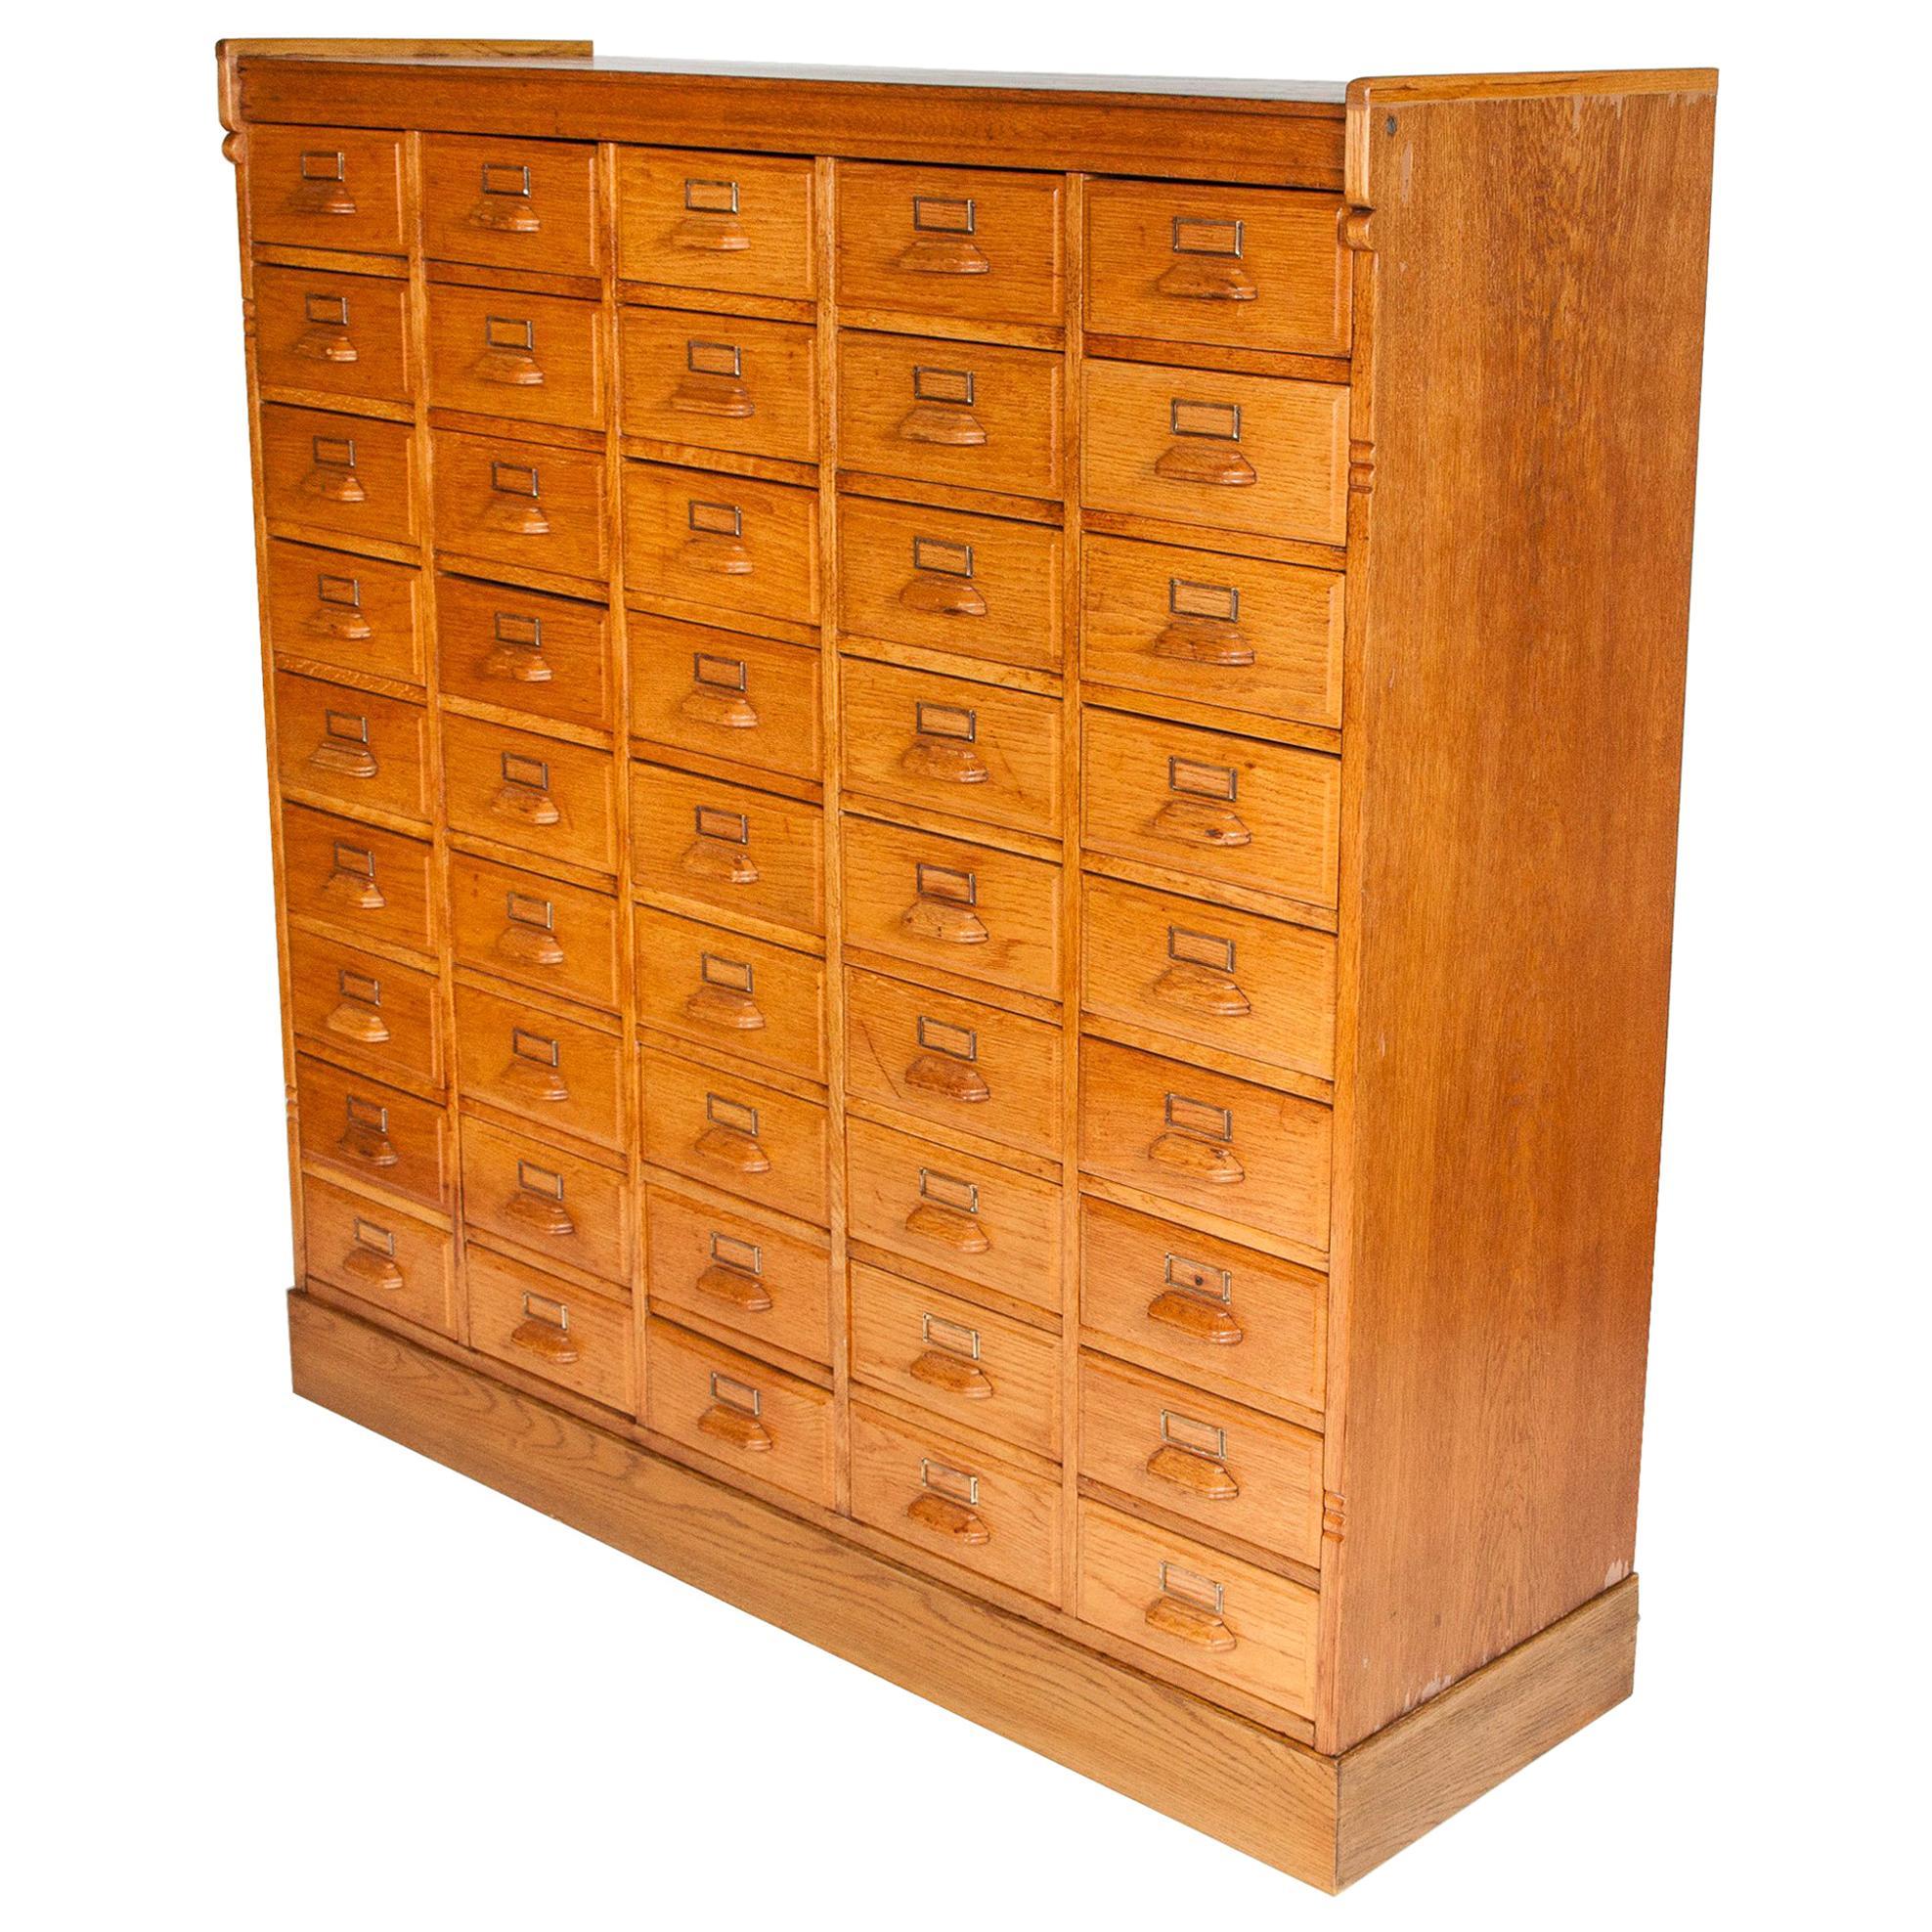 Haberdashery Cabinet, Oak with Brass Label Holders